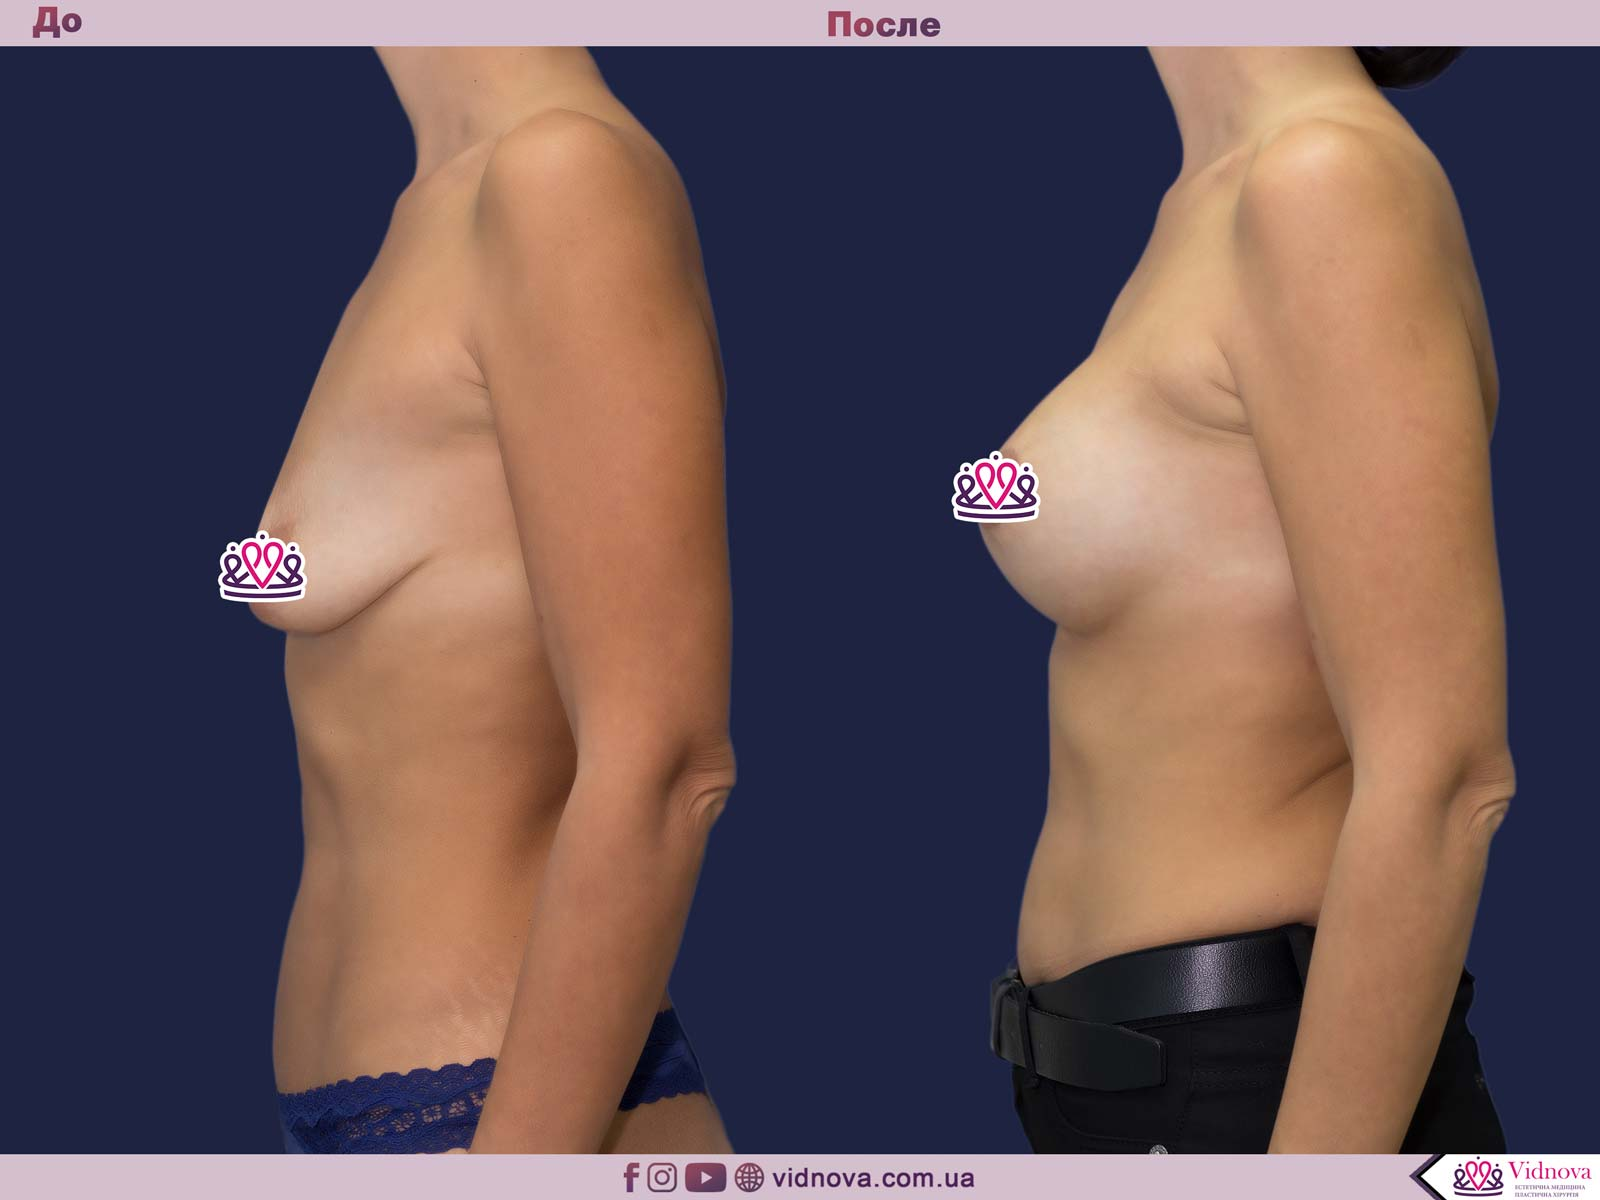 Увеличение груди: Фото ДО и ПОСЛЕ - Пример №68-3 - Клиника Vidnova